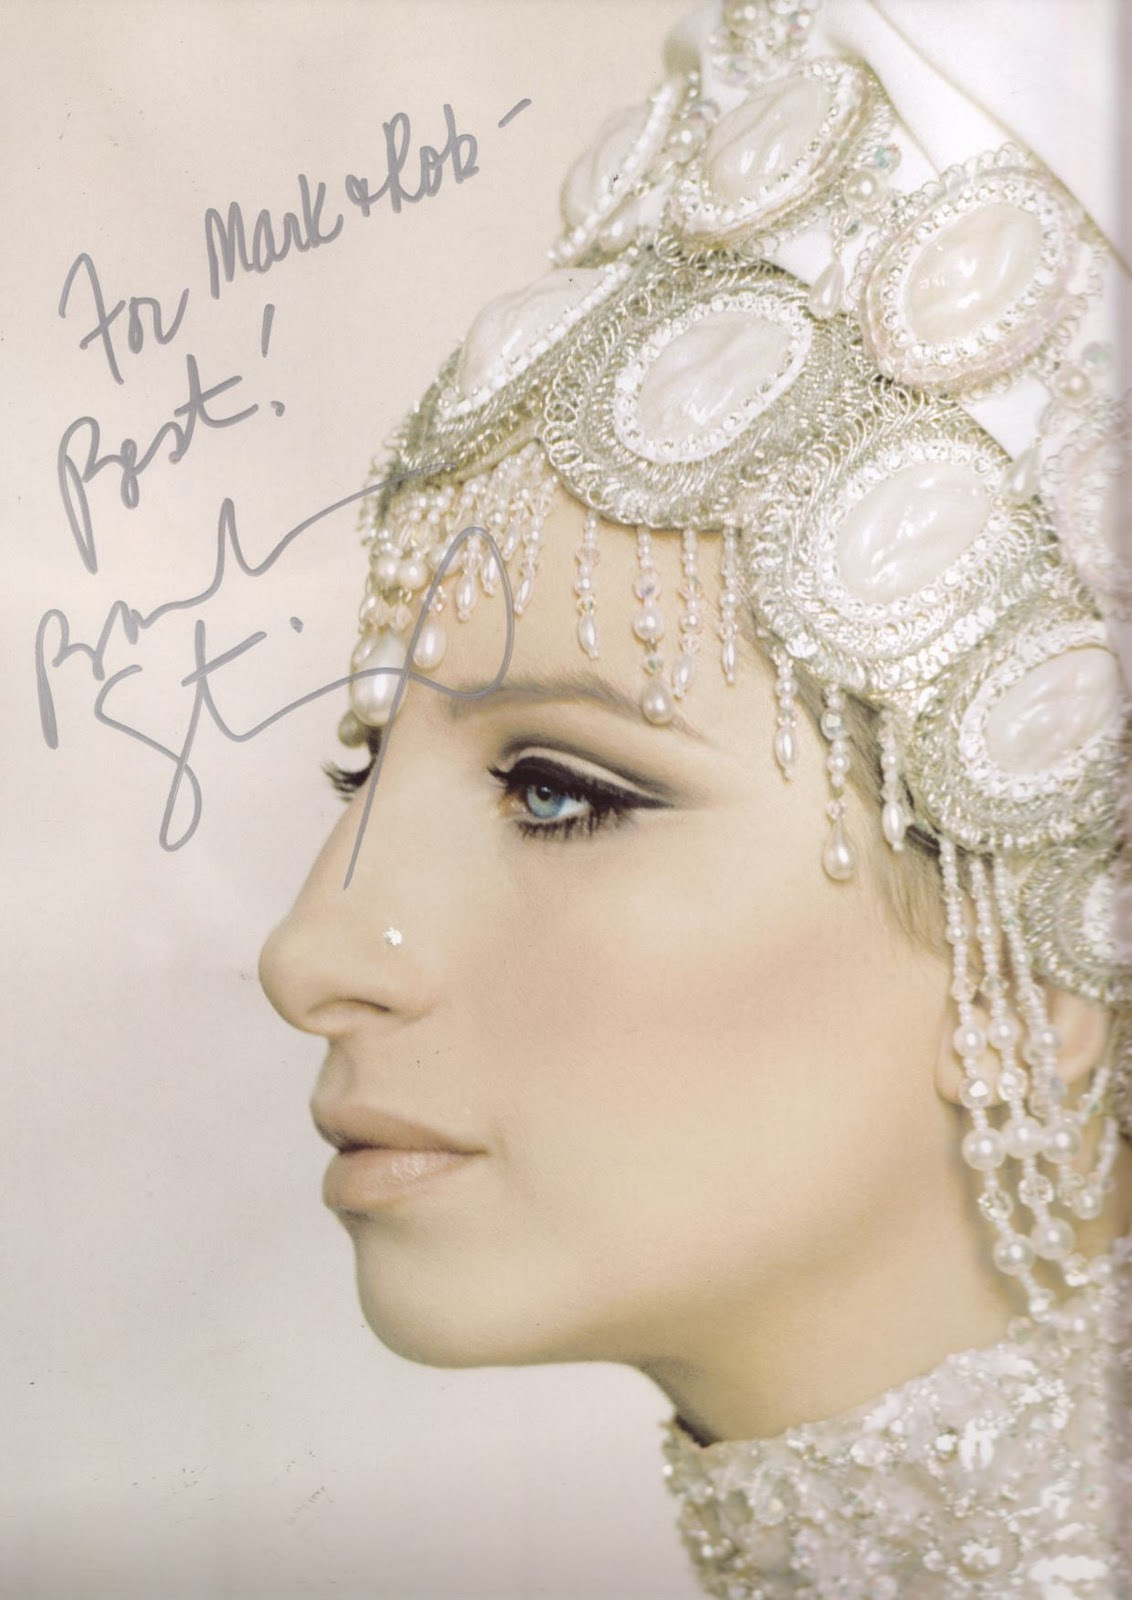 http://2.bp.blogspot.com/_MtcG6Tn8mk8/TSJCpMP3DpI/AAAAAAAABRw/bUGw4xsqBac/s1600/Barbra_Streisand-r858318.jpg